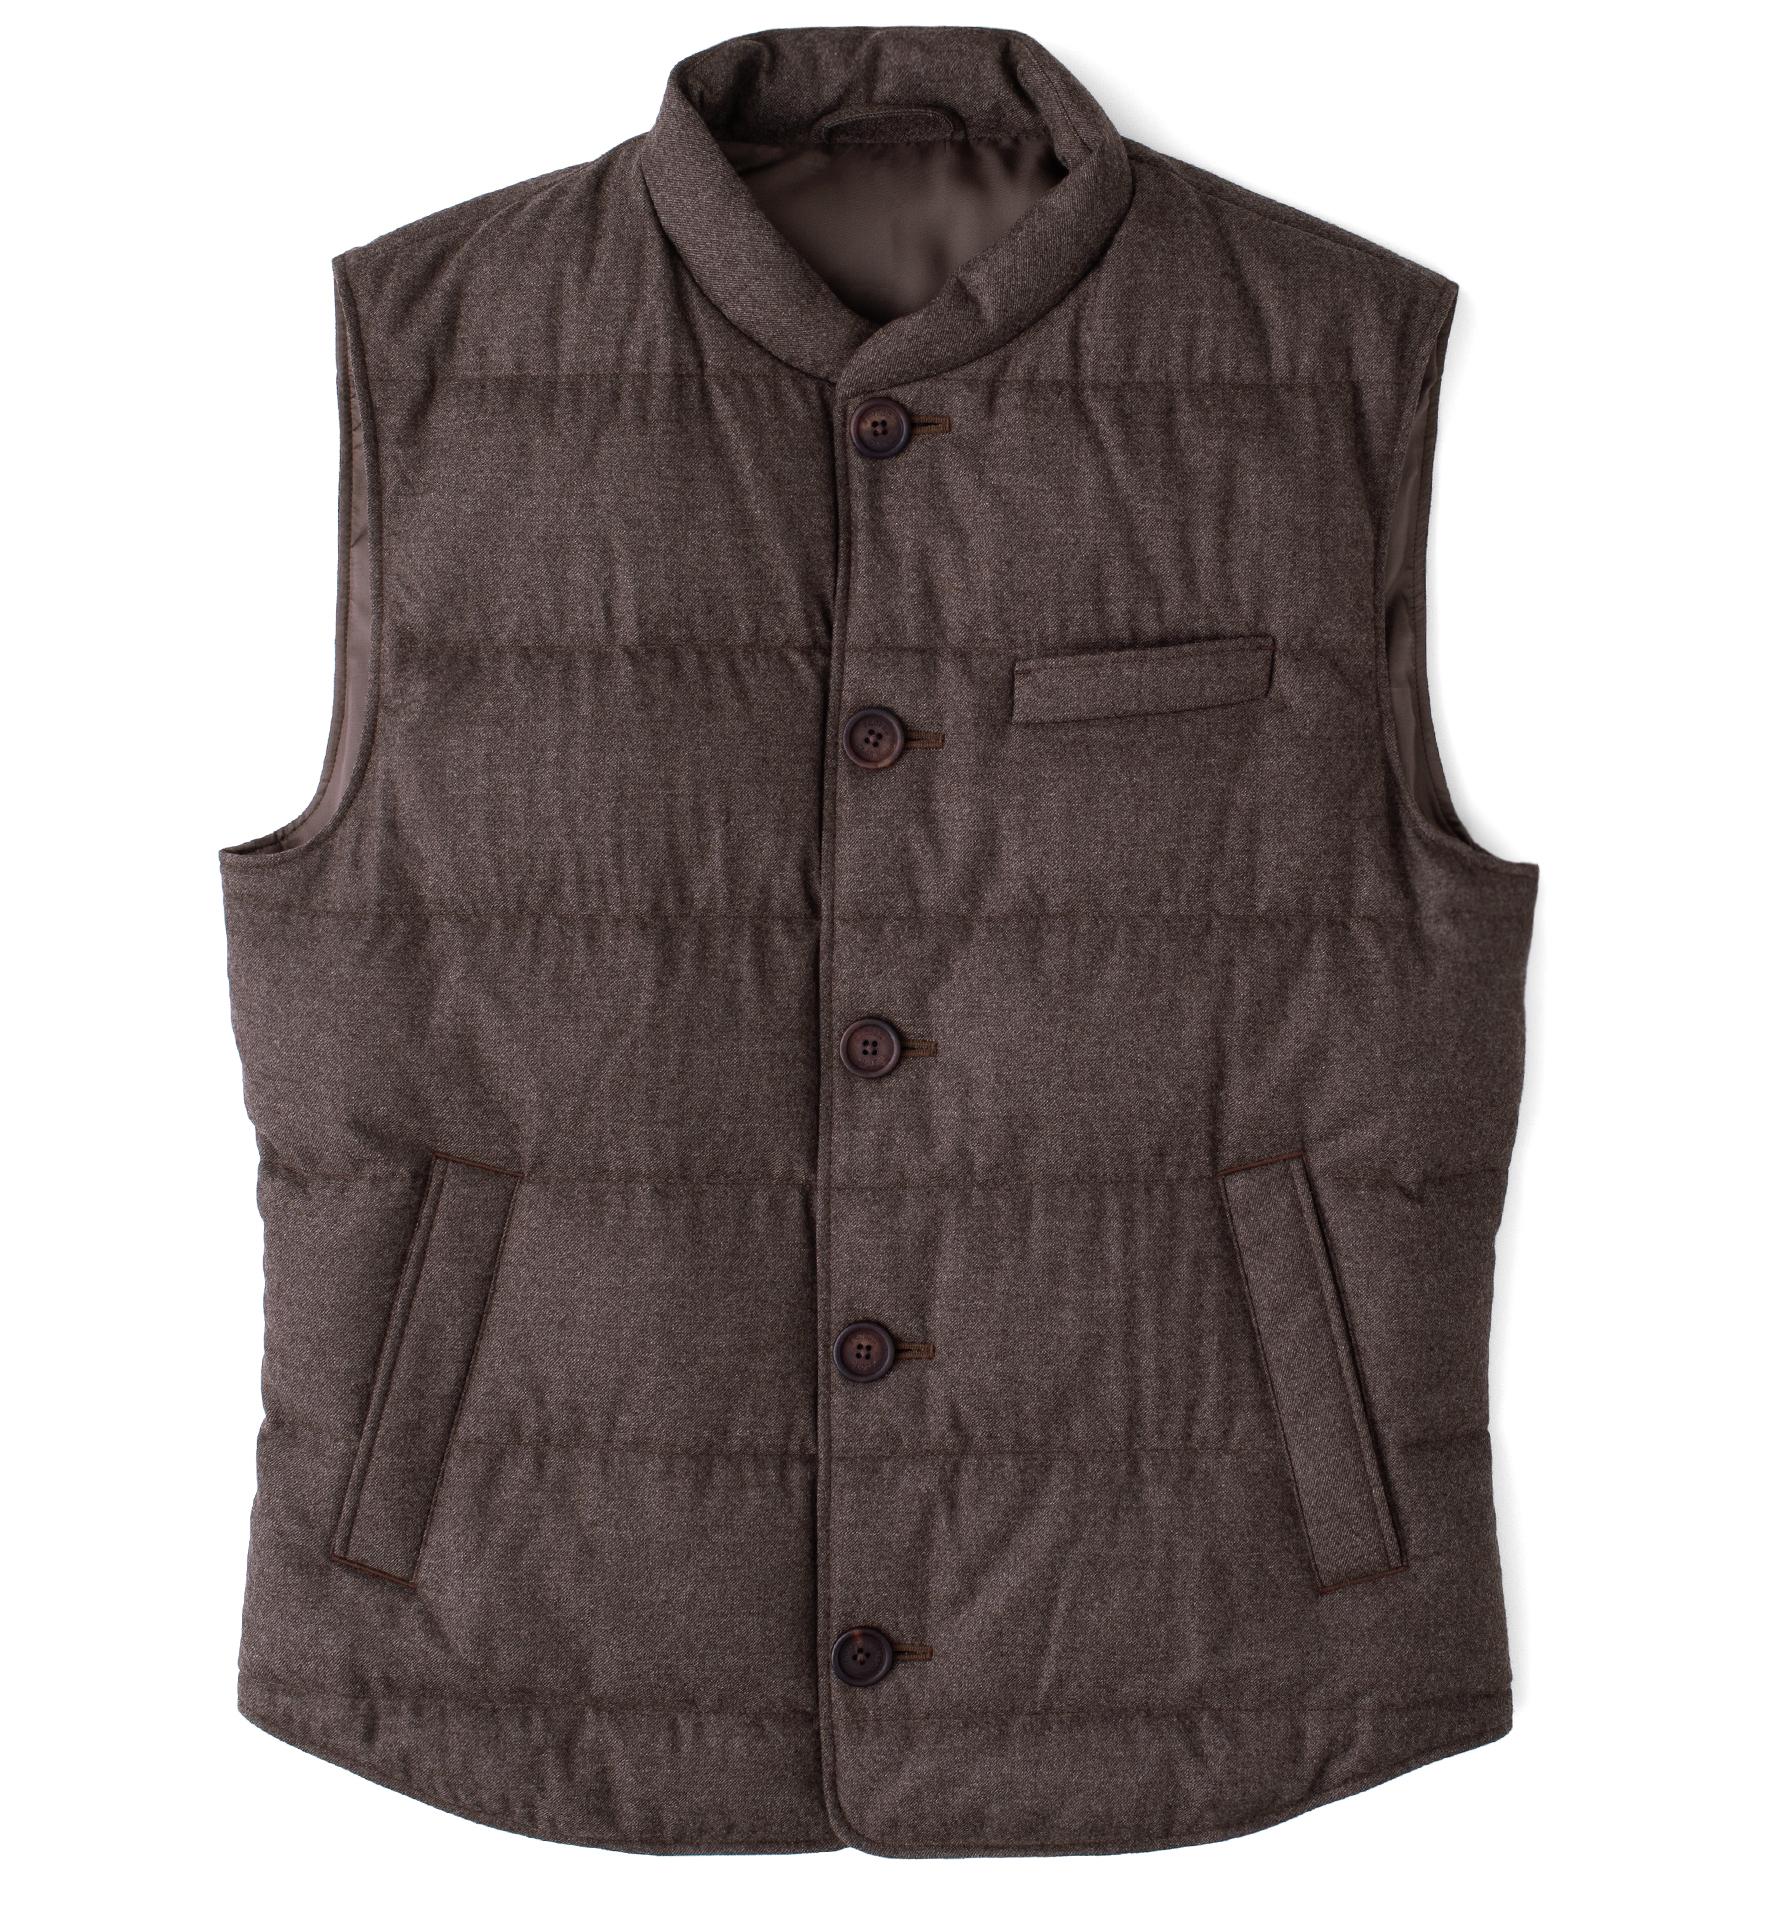 Zoom Image of Cortina II Chestnut Flannel Button Vest